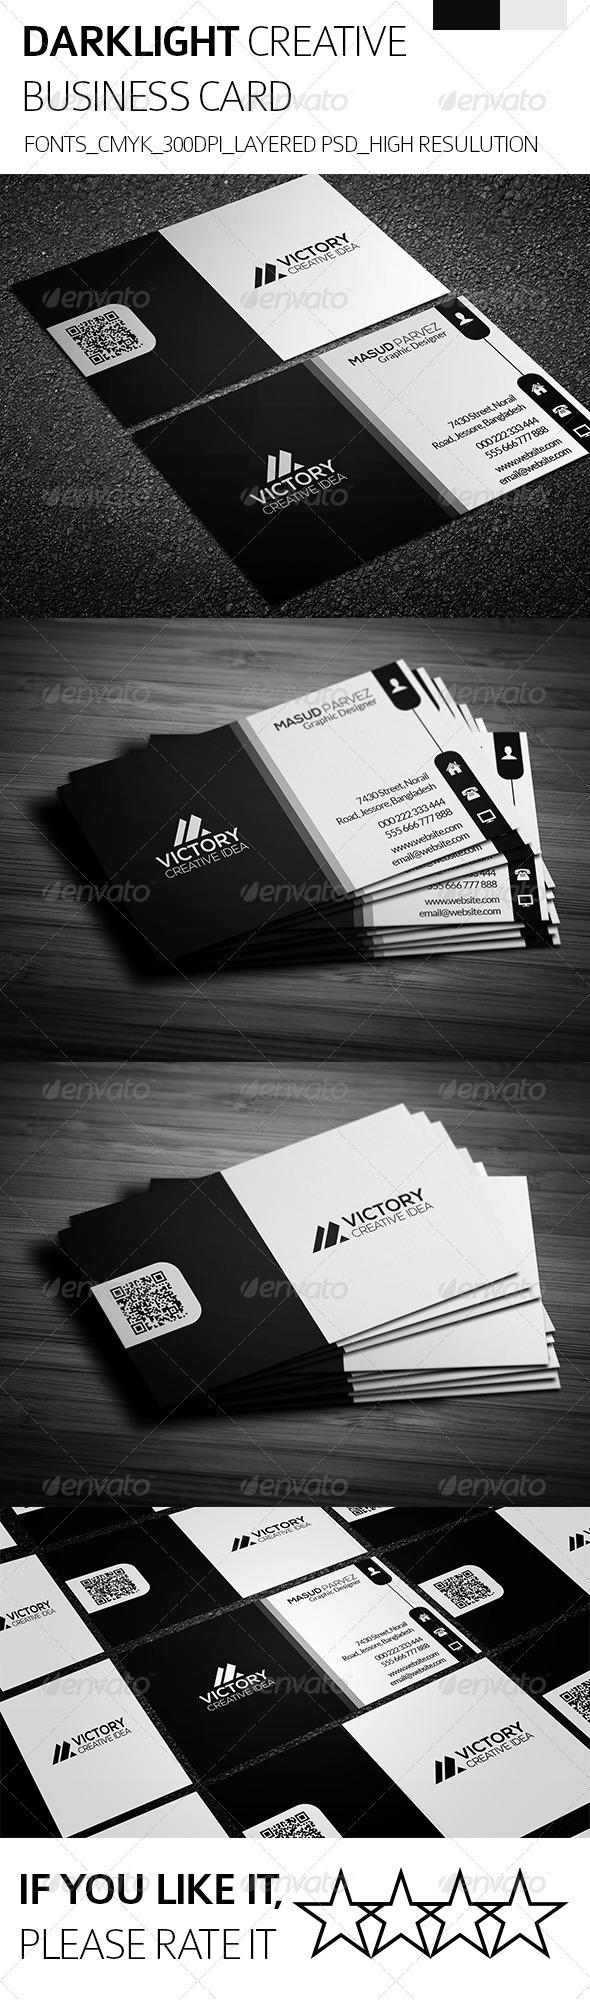 GraphicRiver Dark Light & Creative Business Card 8392211